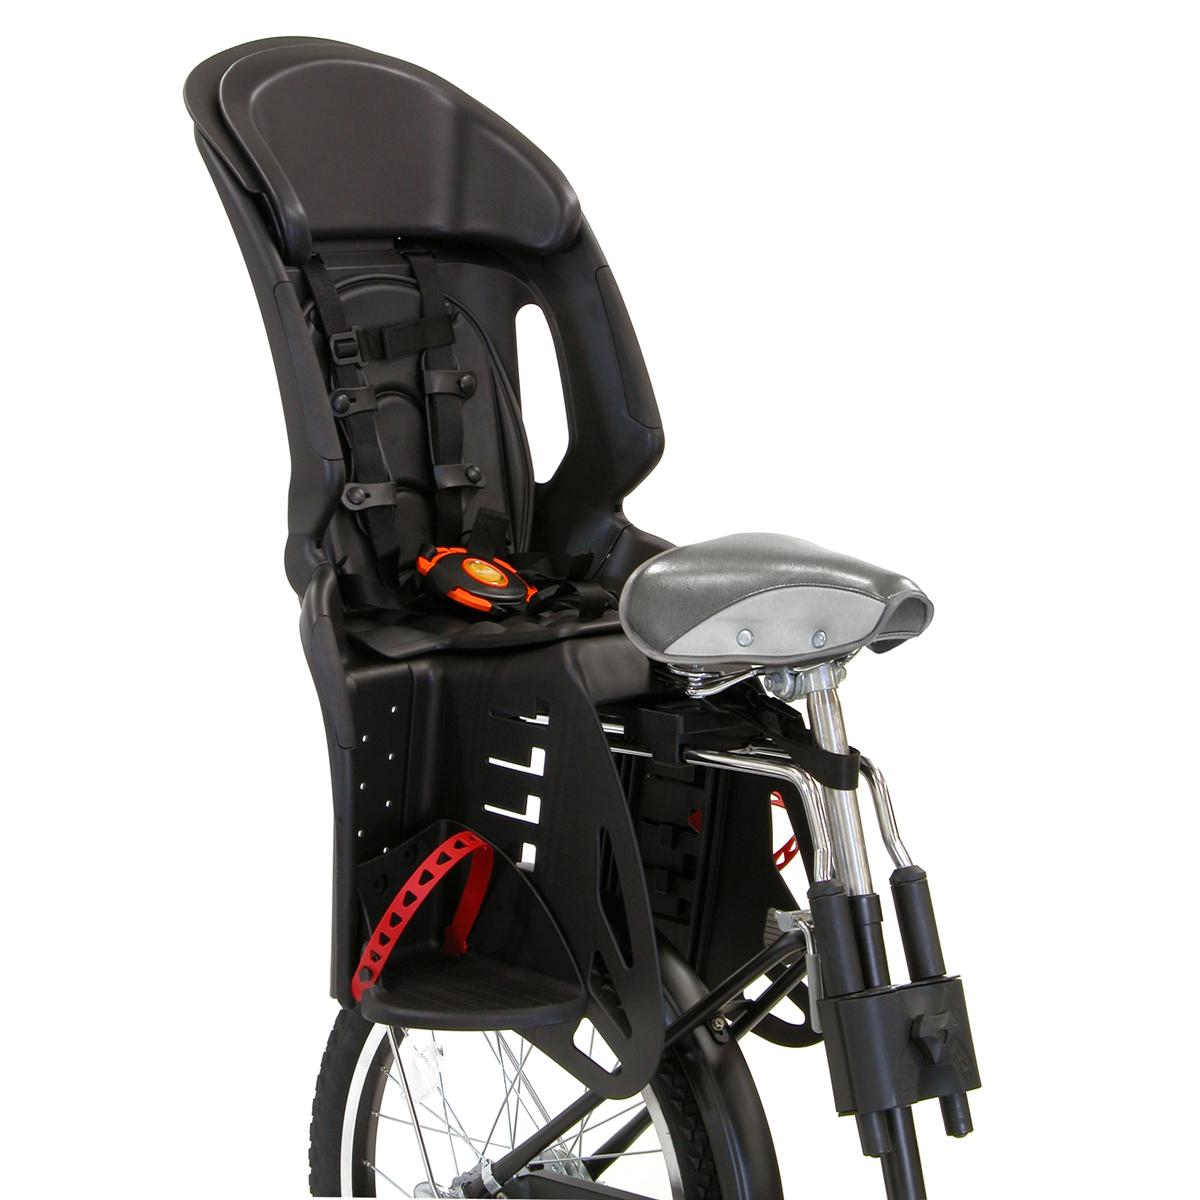 OGK/オージーケー技研 リアチャイルドシート RBC-011DX-SP ブラック(63844-O102) 2~4才未満用 自転車後用子供乗せ